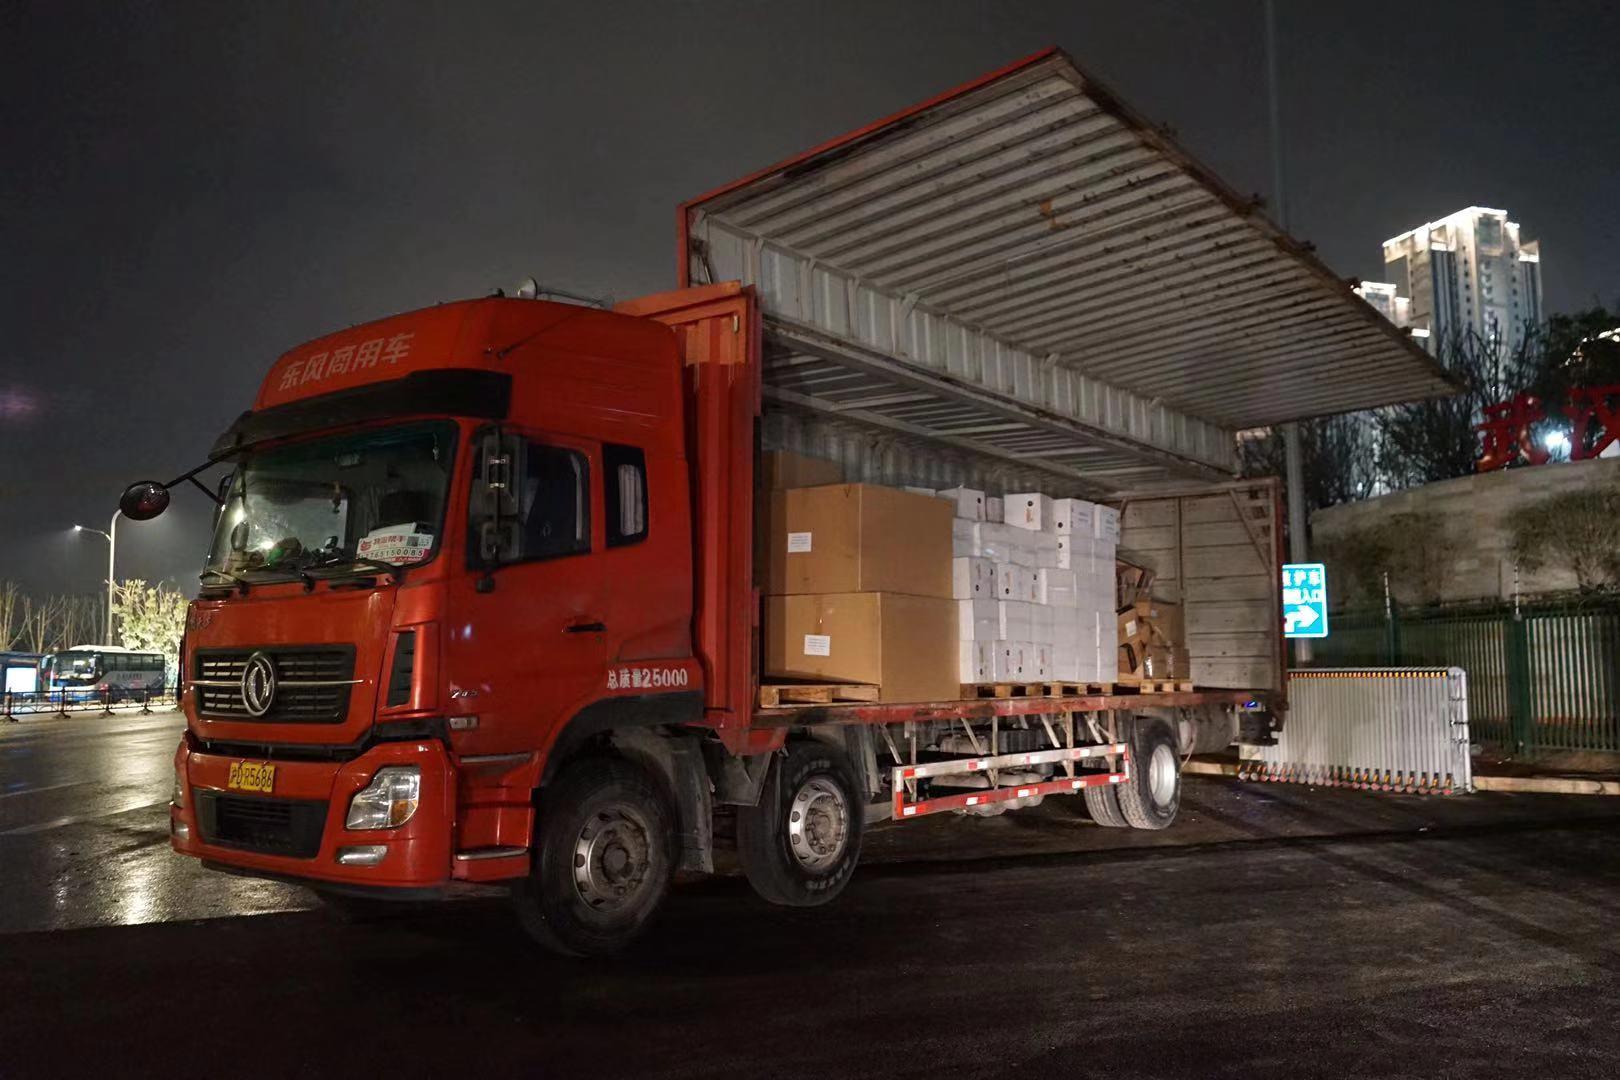 Fosun's latest shipment of medical supplies arrives at Leishenshan Hospital